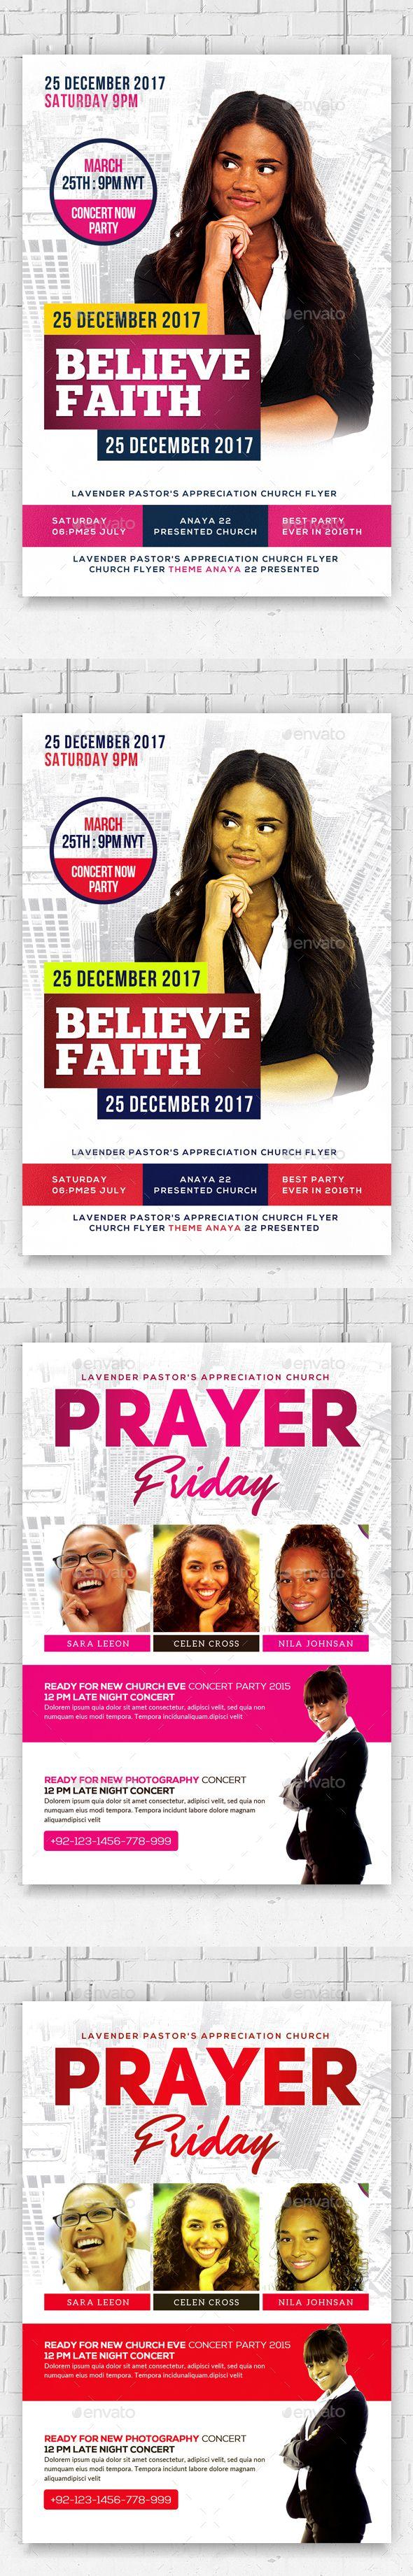 women of prayer church flyers bundle prayer flyers and photoshop women of prayer church flyers bundle photoshop psd prayer breakfast women of prayer